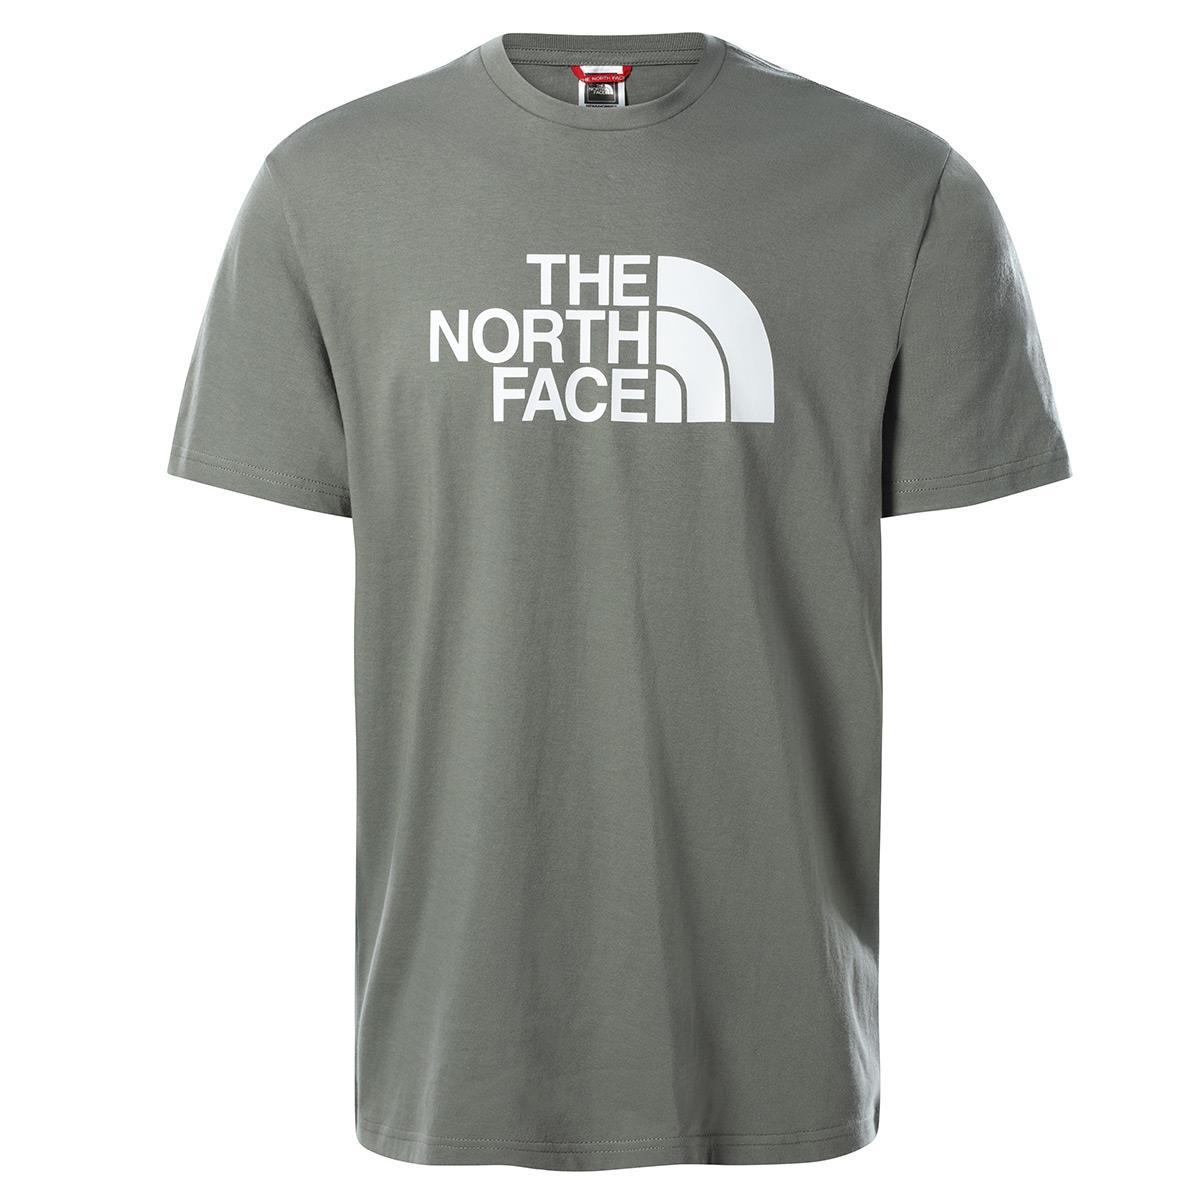 The North Face  Erkek S/S EASY Tişört